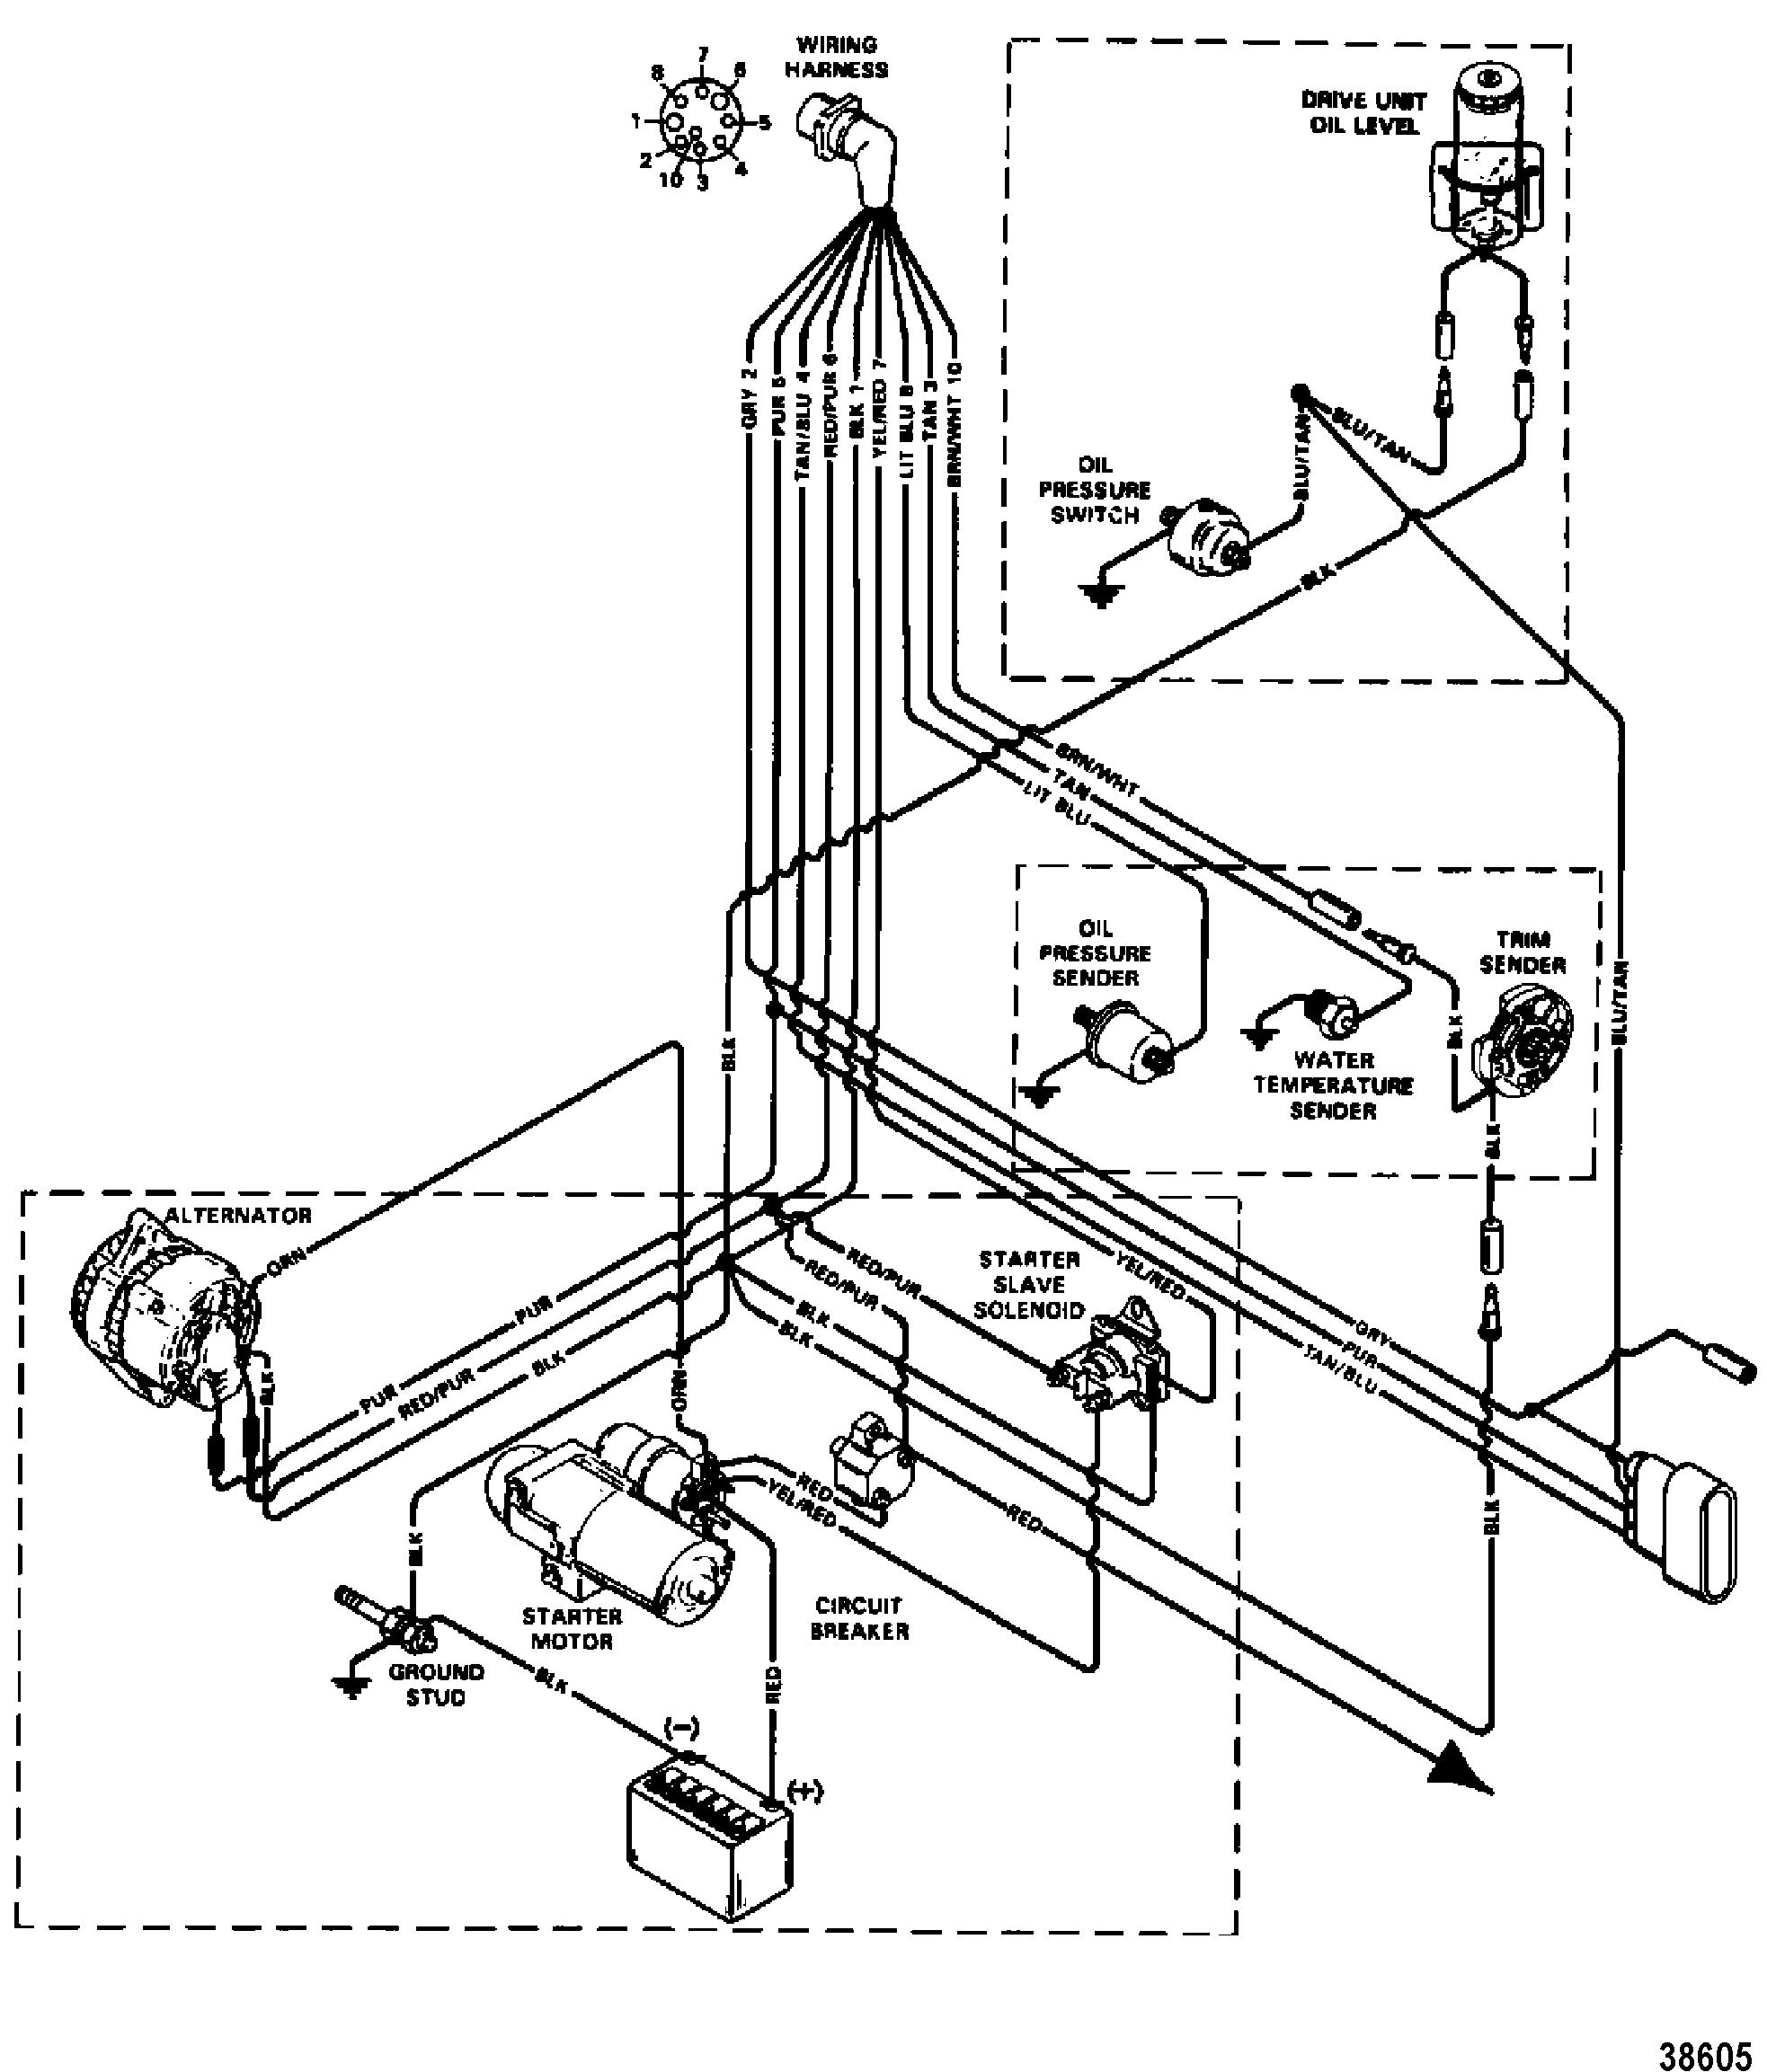 Mercruiser Wire Diagram | Manual E-Books - Mercruiser Wiring Diagram